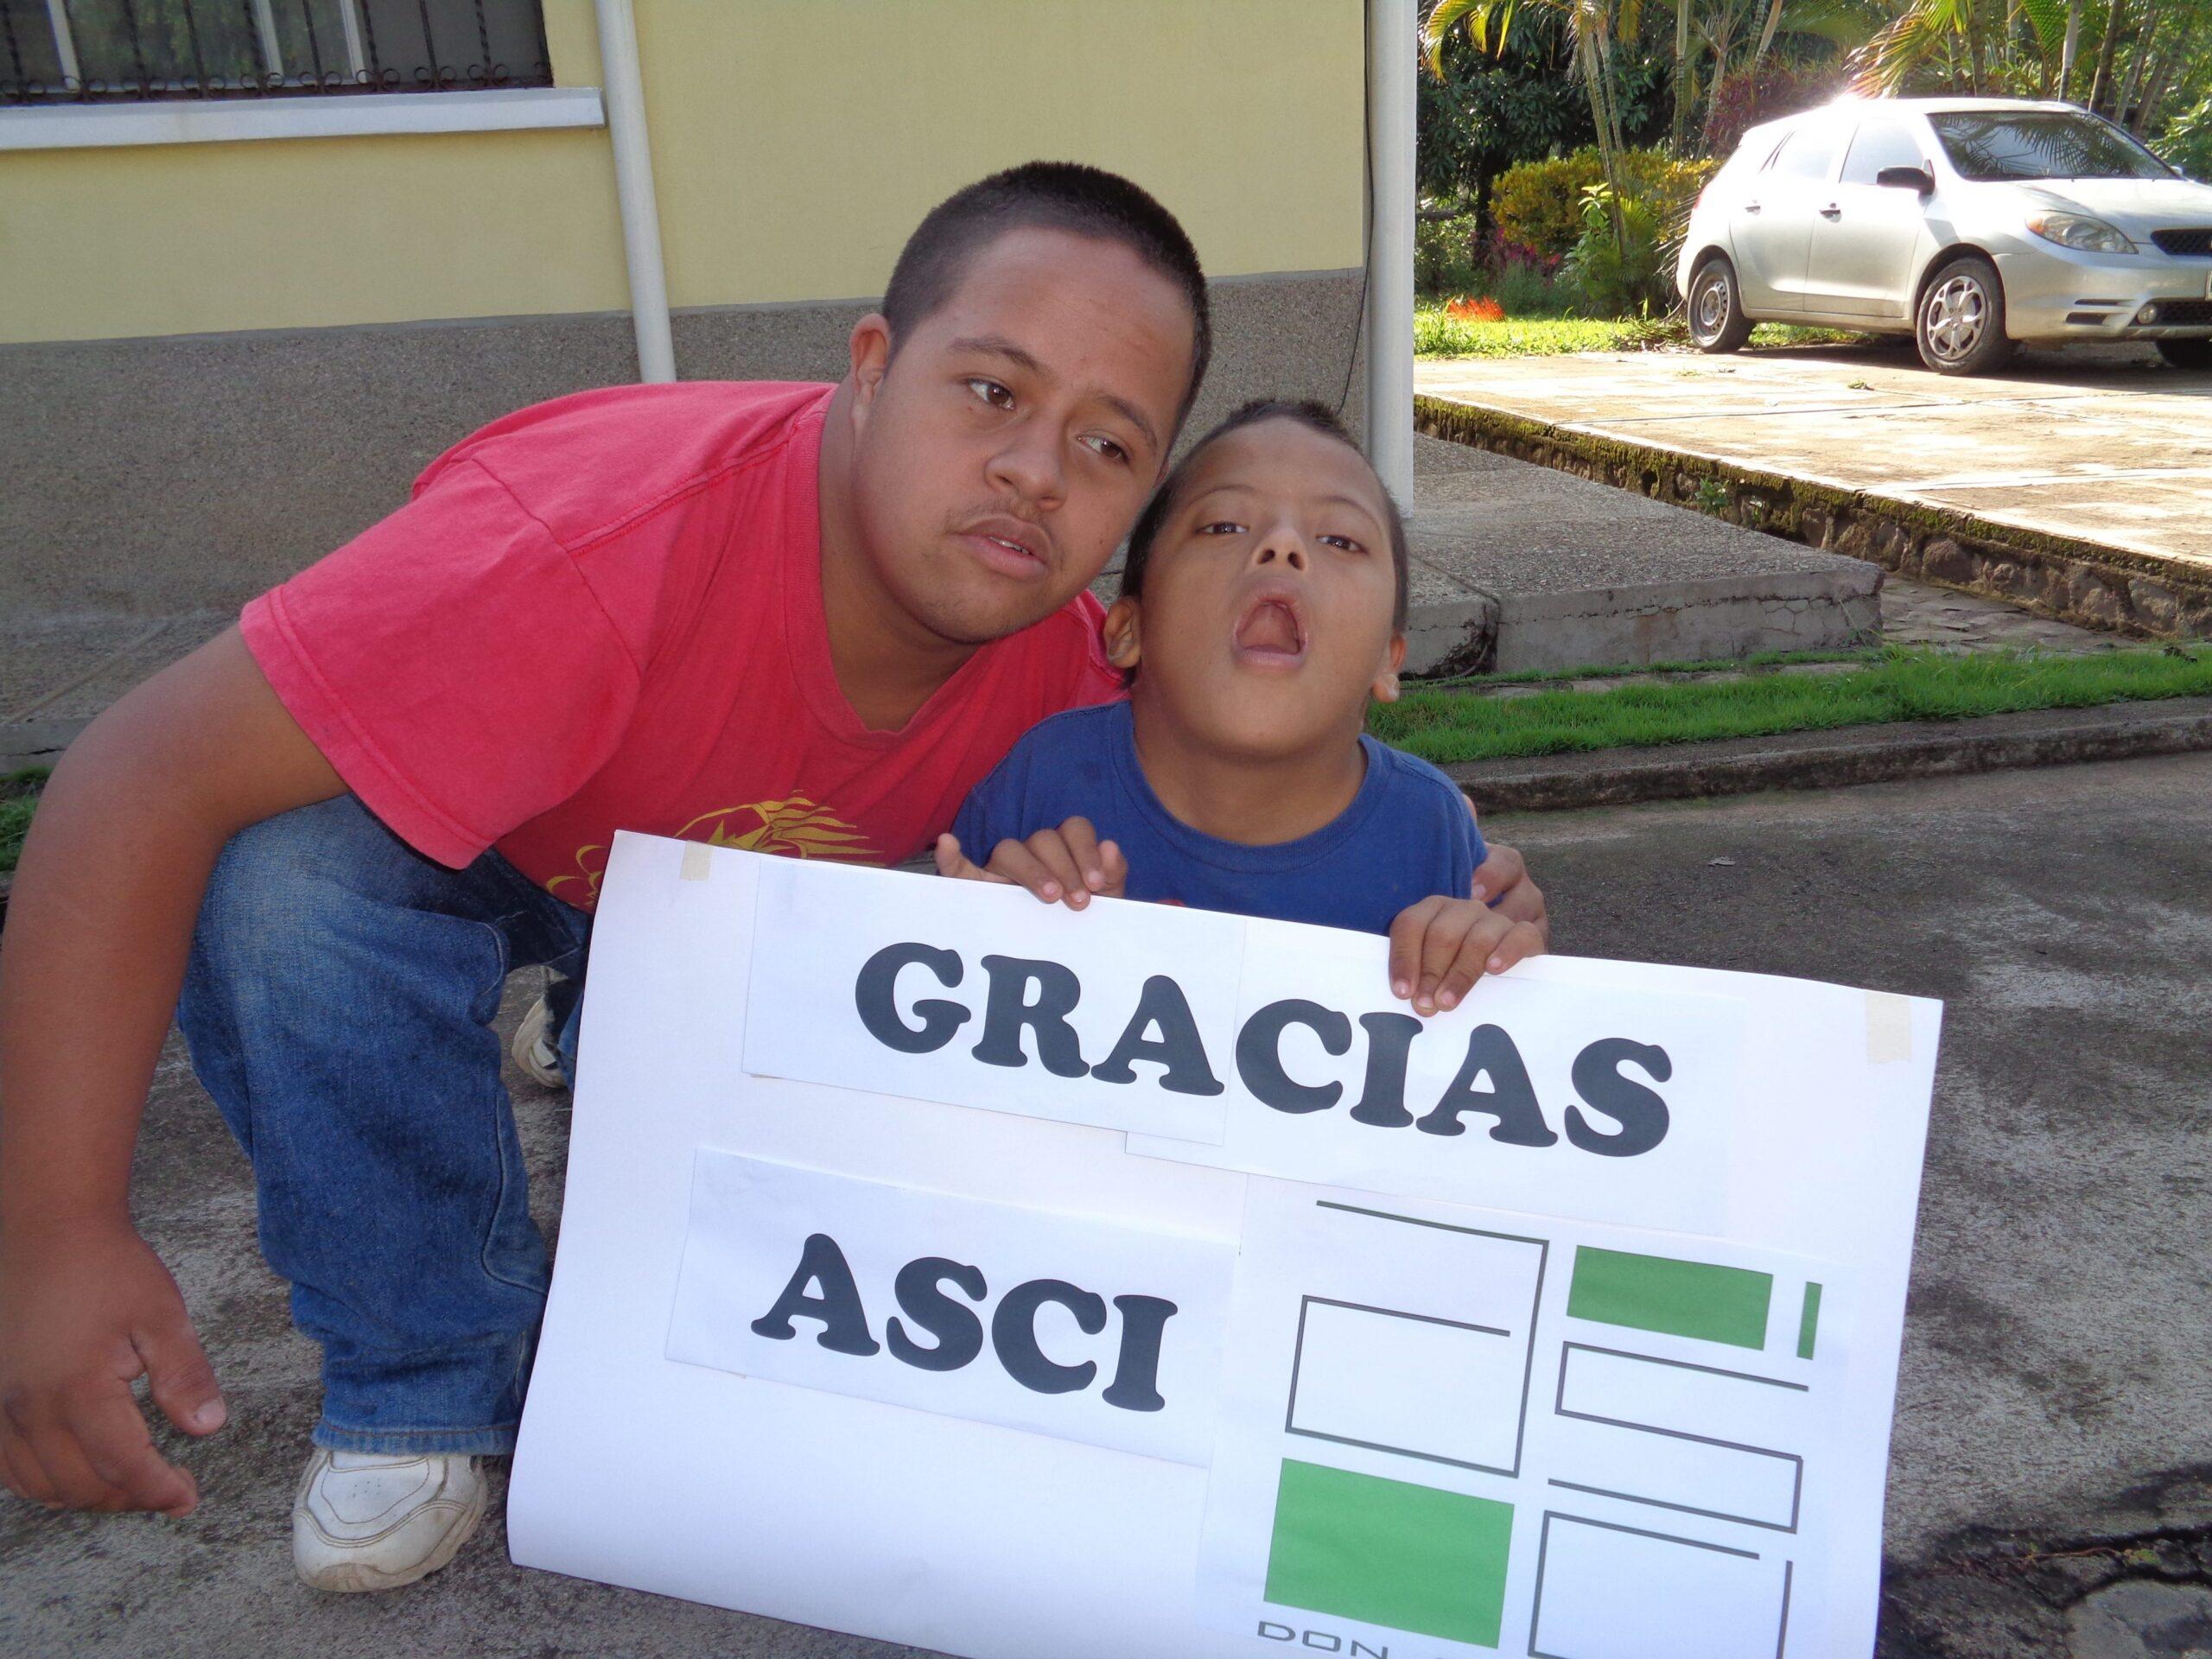 ASCI don Guanella per i guanelliani in Guatemala